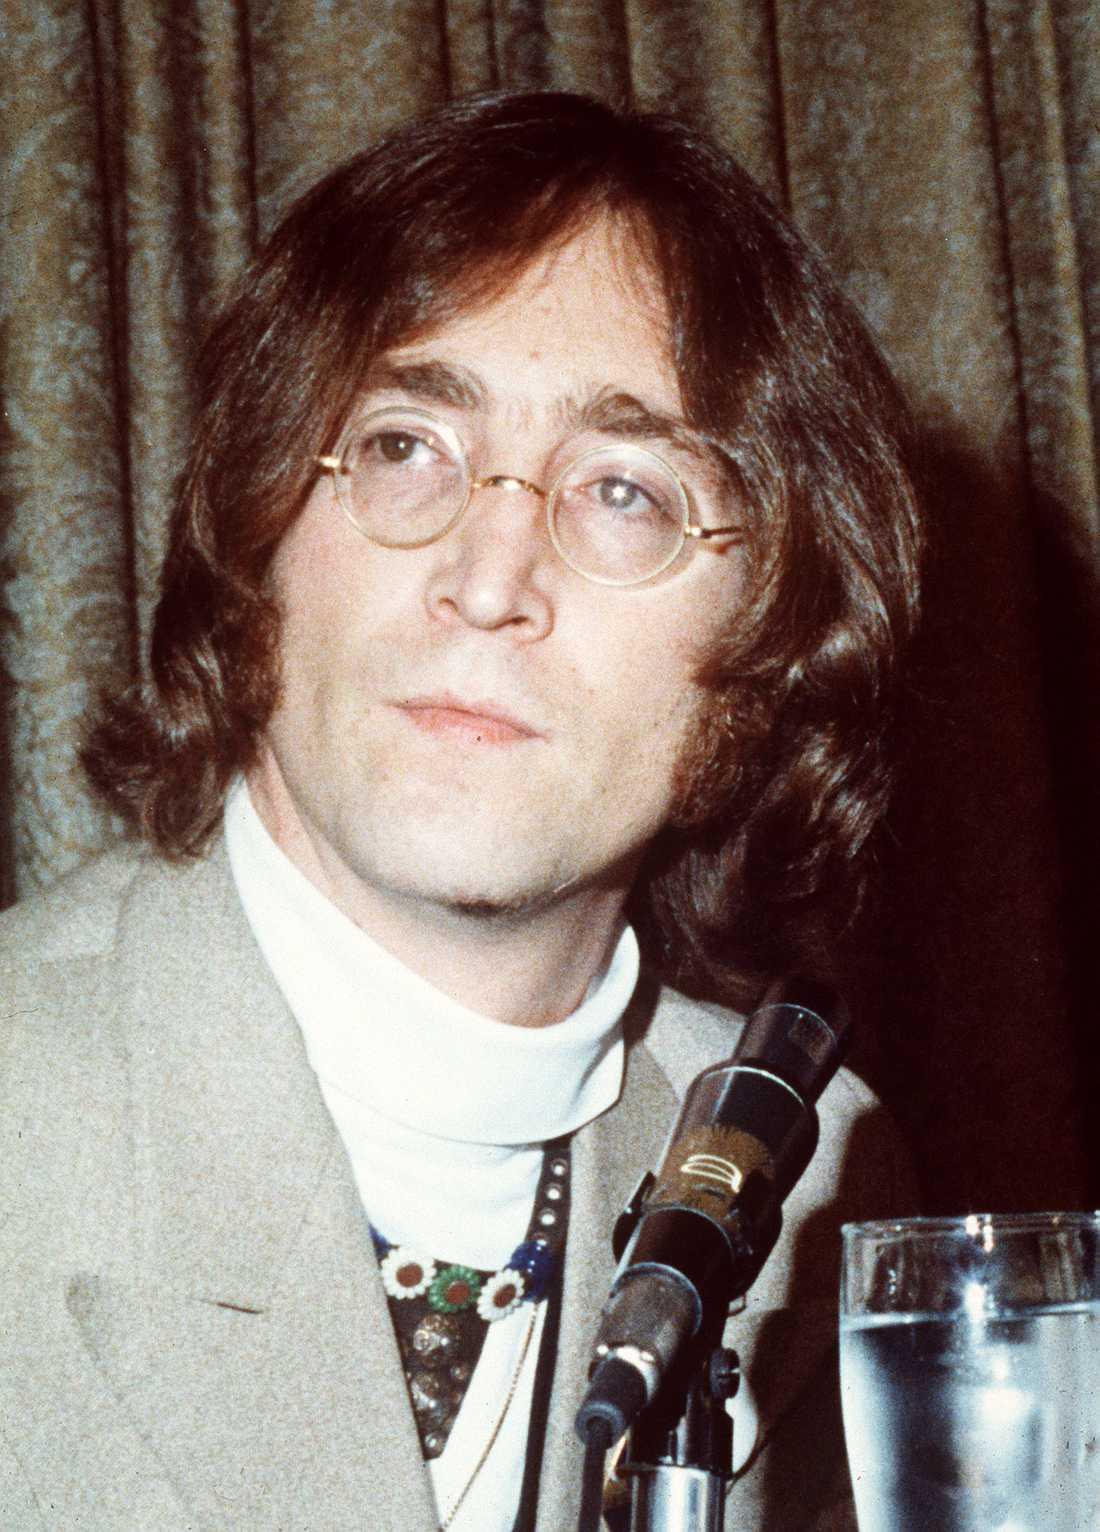 5 John Lennon, The Beatles.